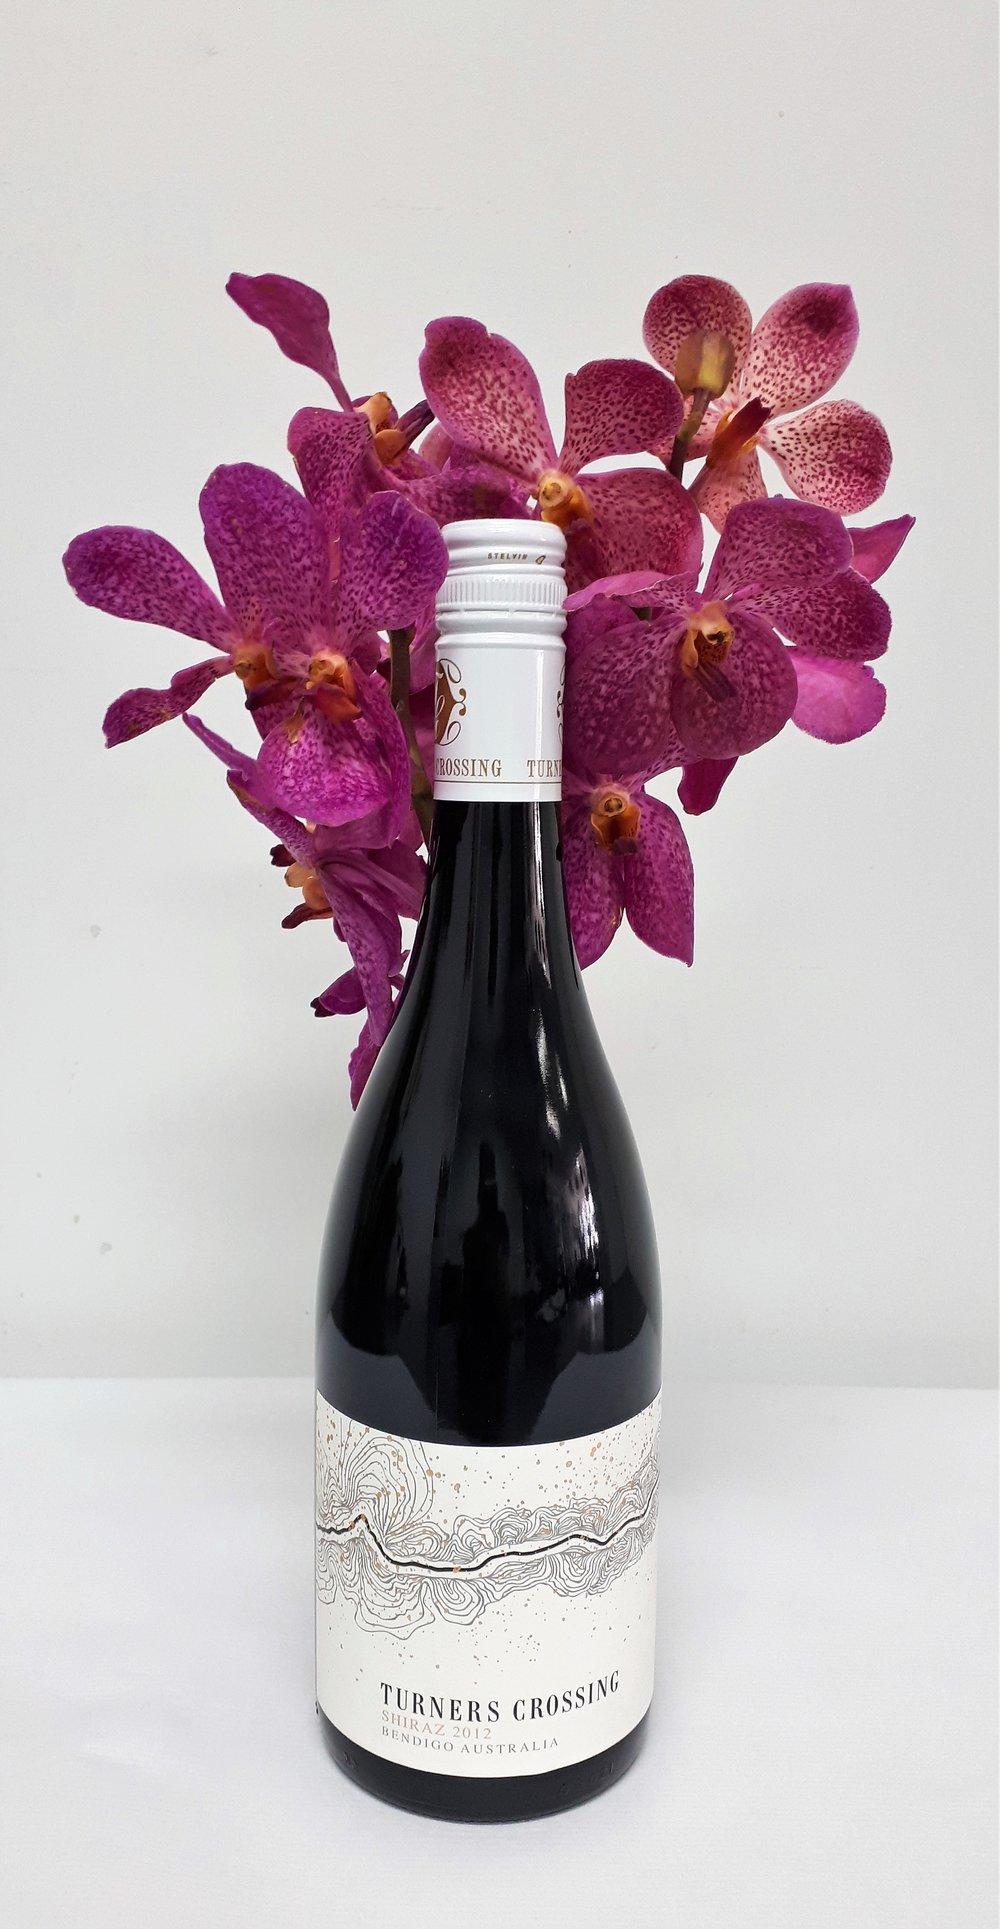 Gifts Red wine.jpg